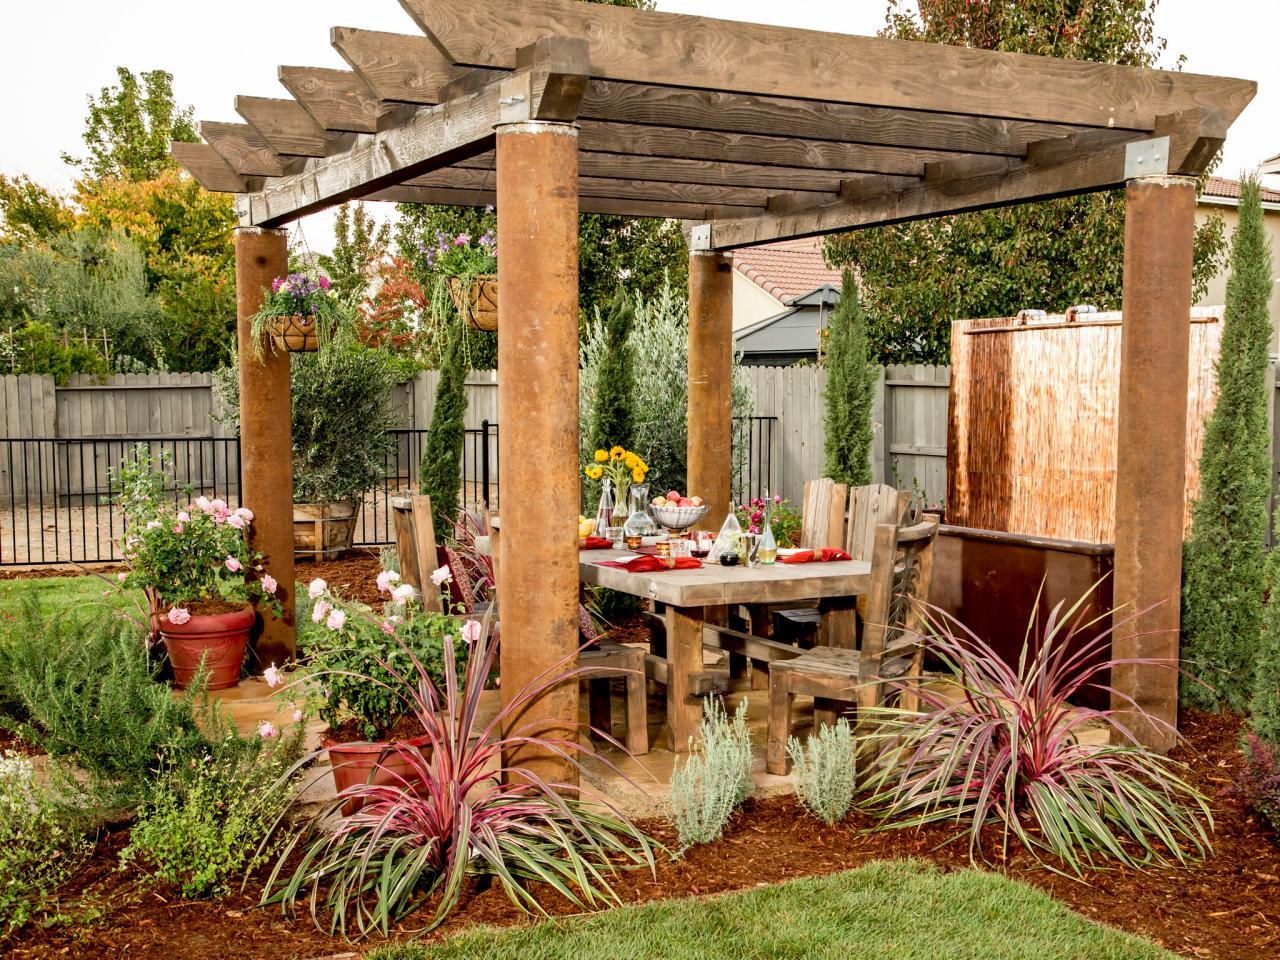 6 Top Picks for a Relaxing Backyard on Hgtv Backyard Designs id=37150